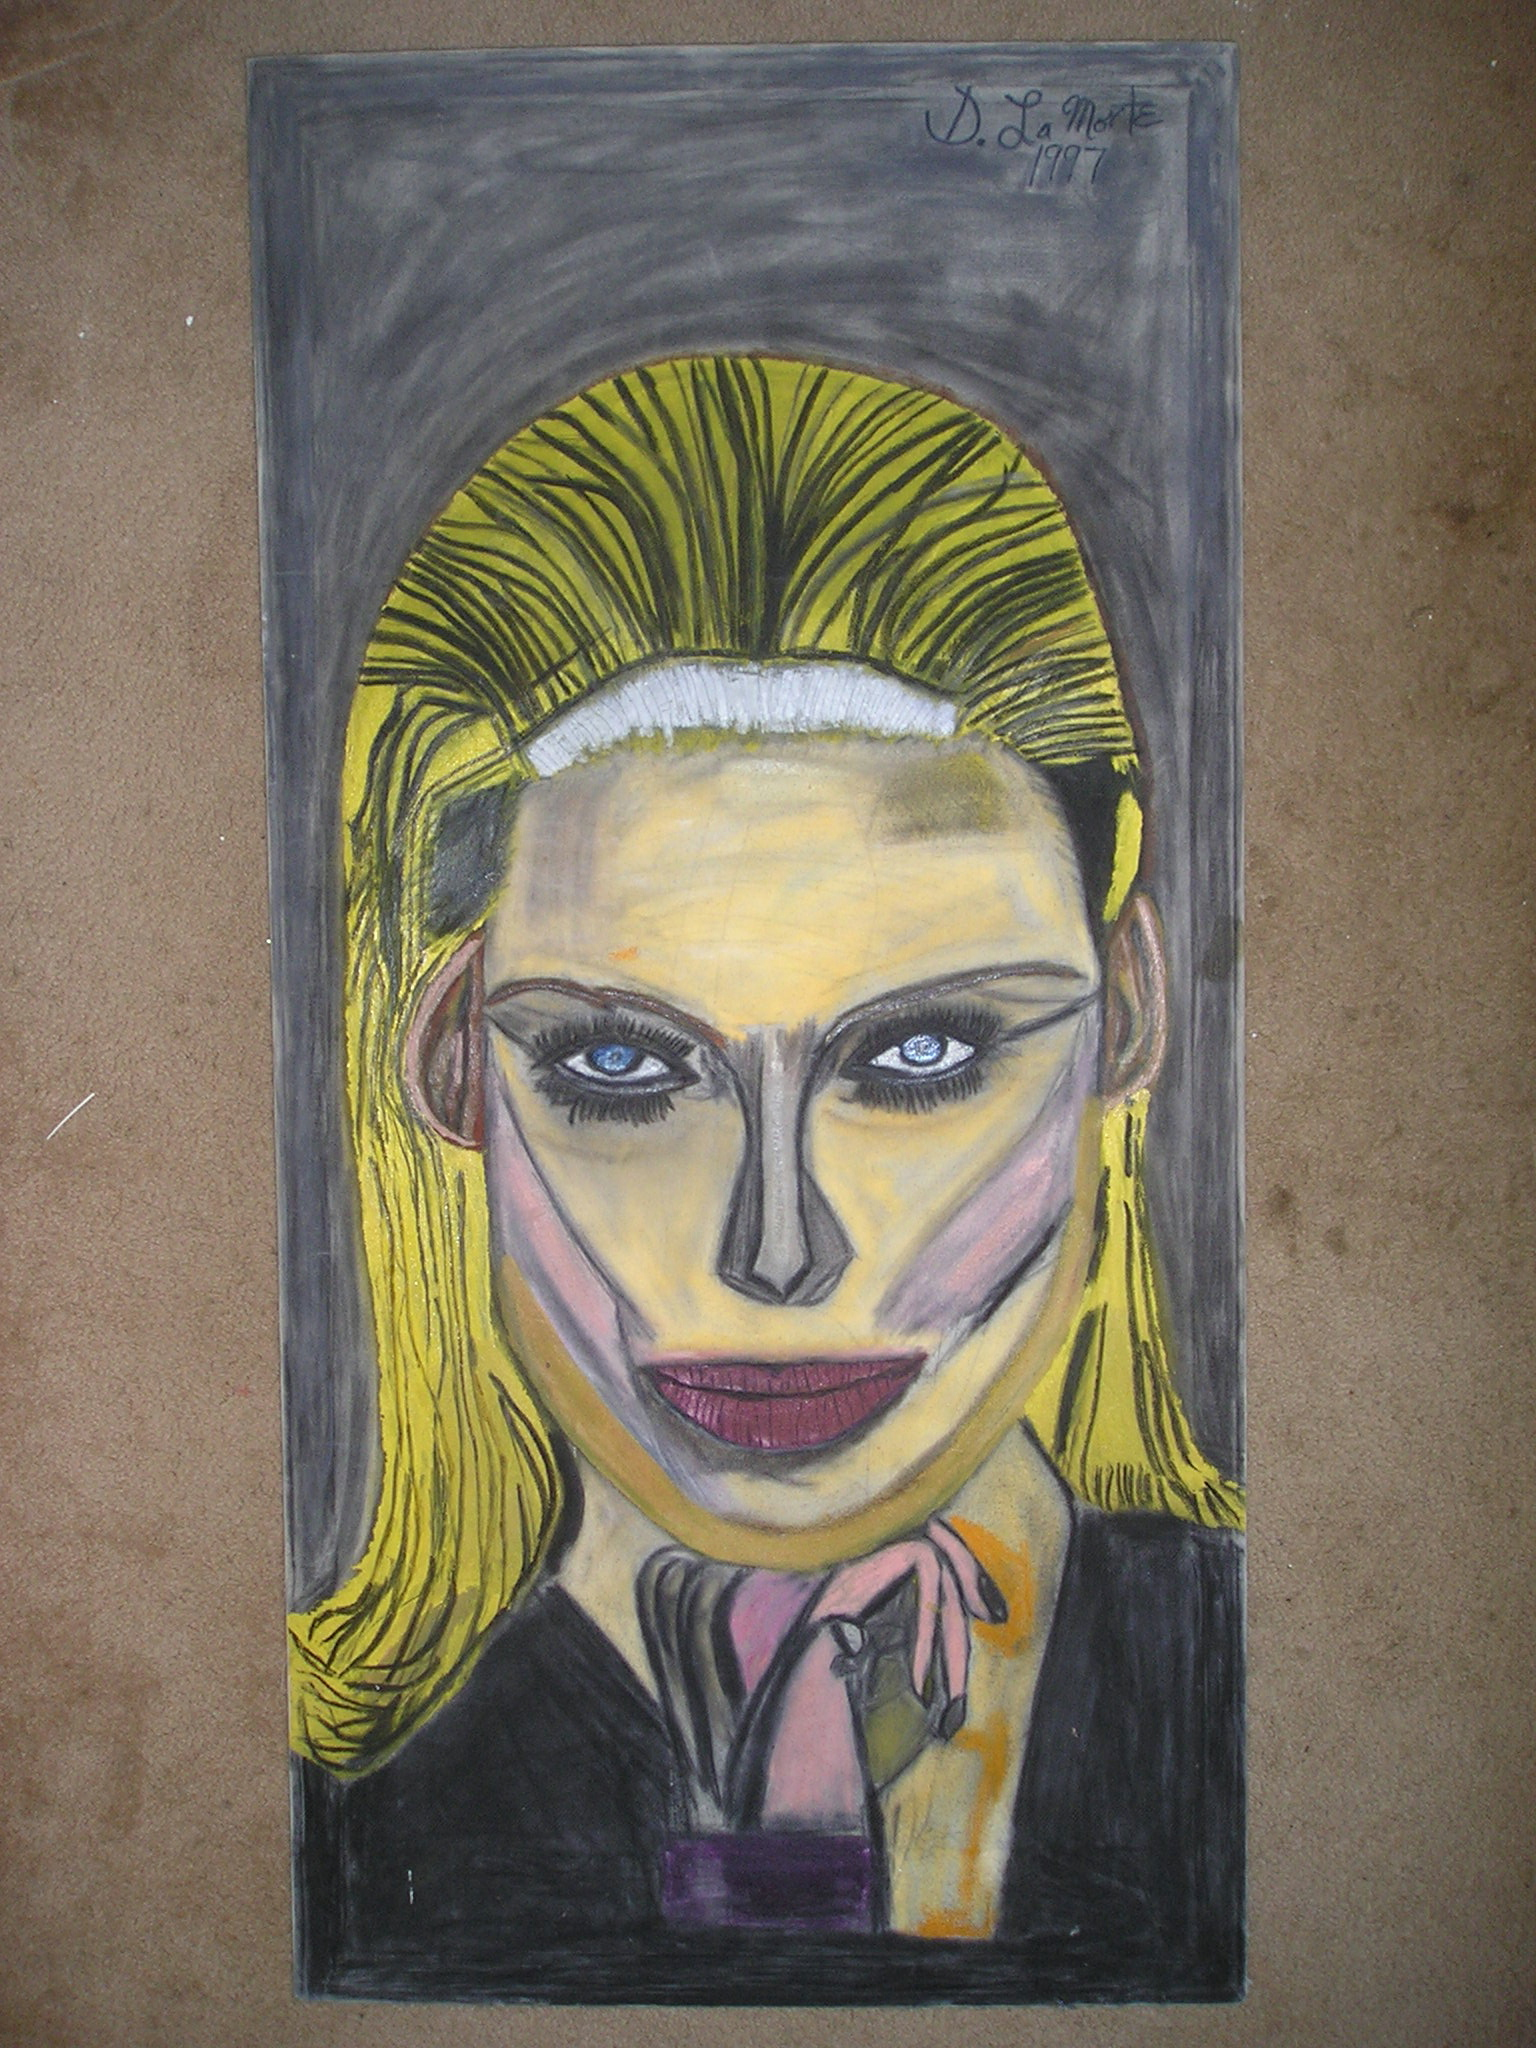 the artist showcase-